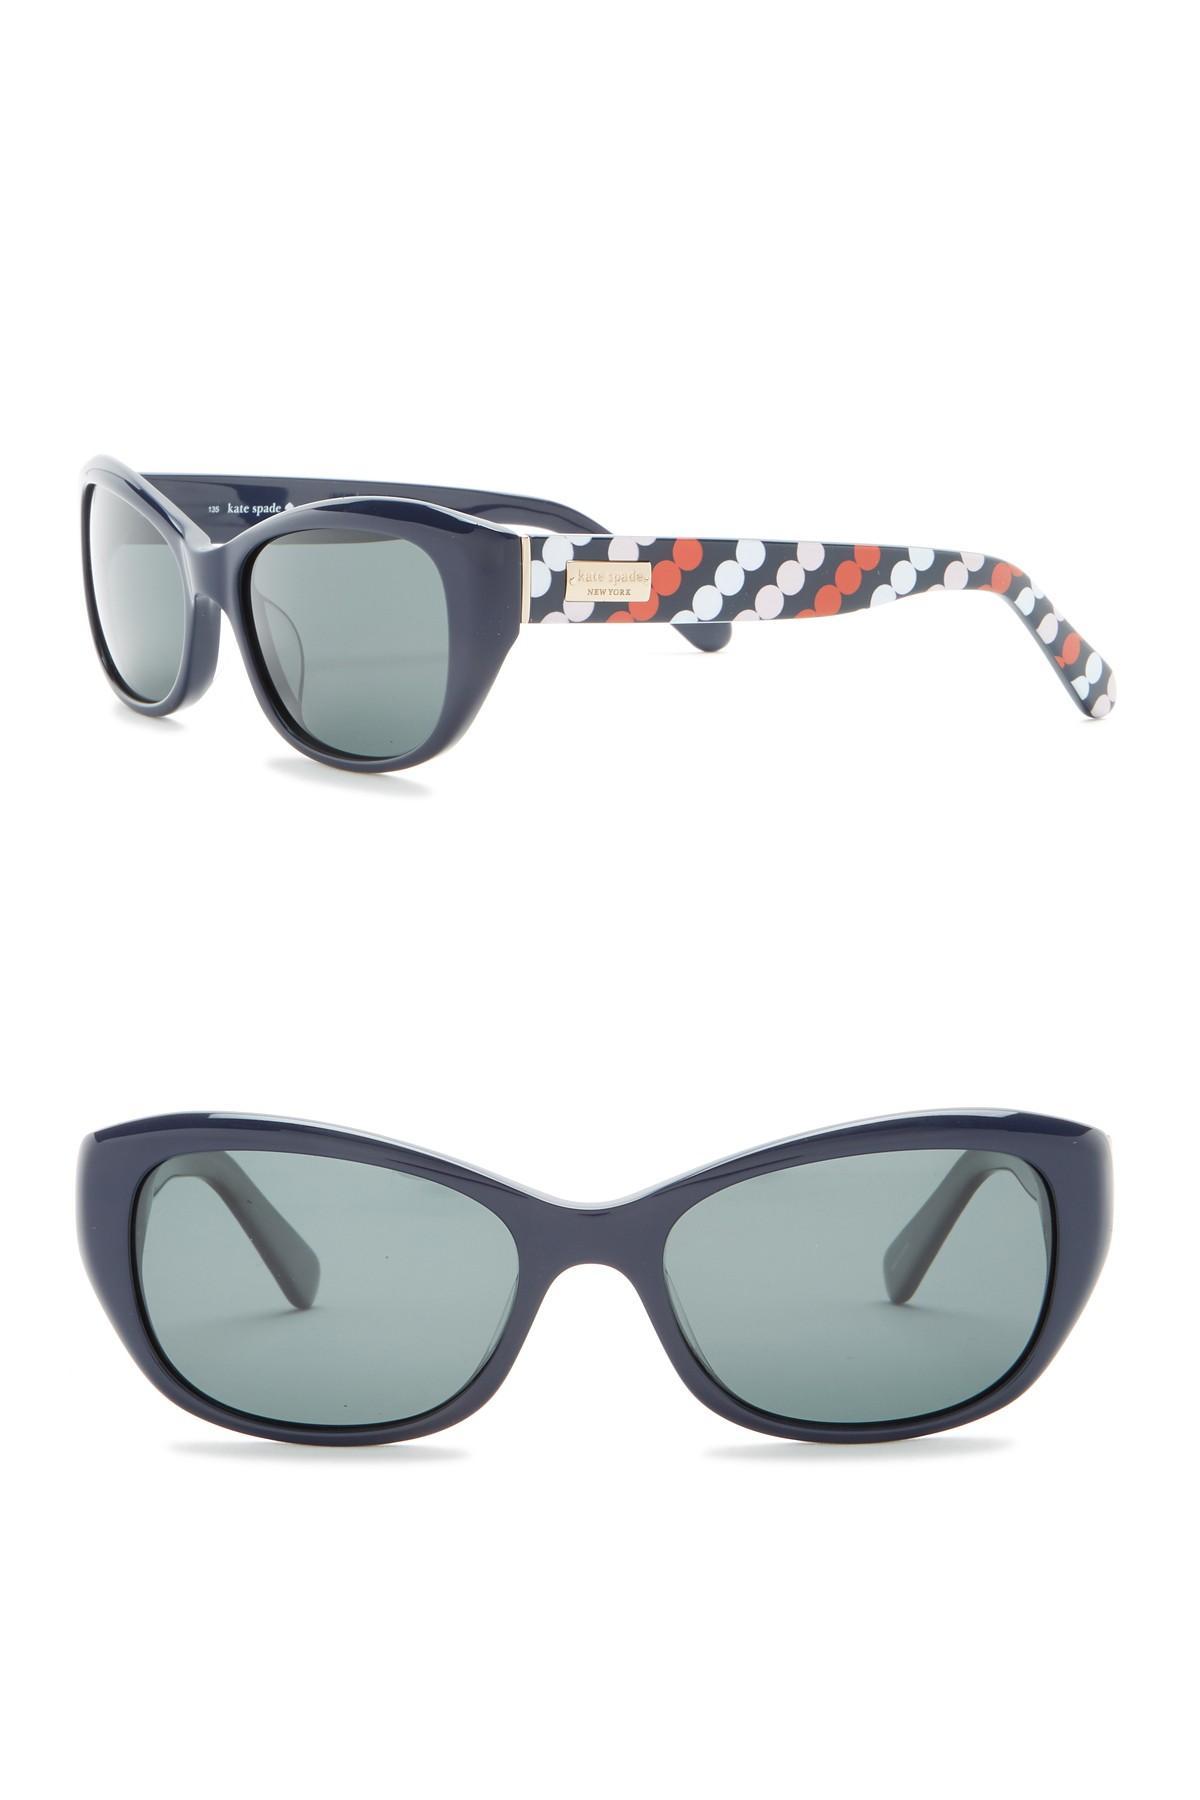 467e3c4a5d32 Kate Spade - Multicolor 51mm Keara Rectangle Cat Eye Sunglasses - Lyst.  View fullscreen